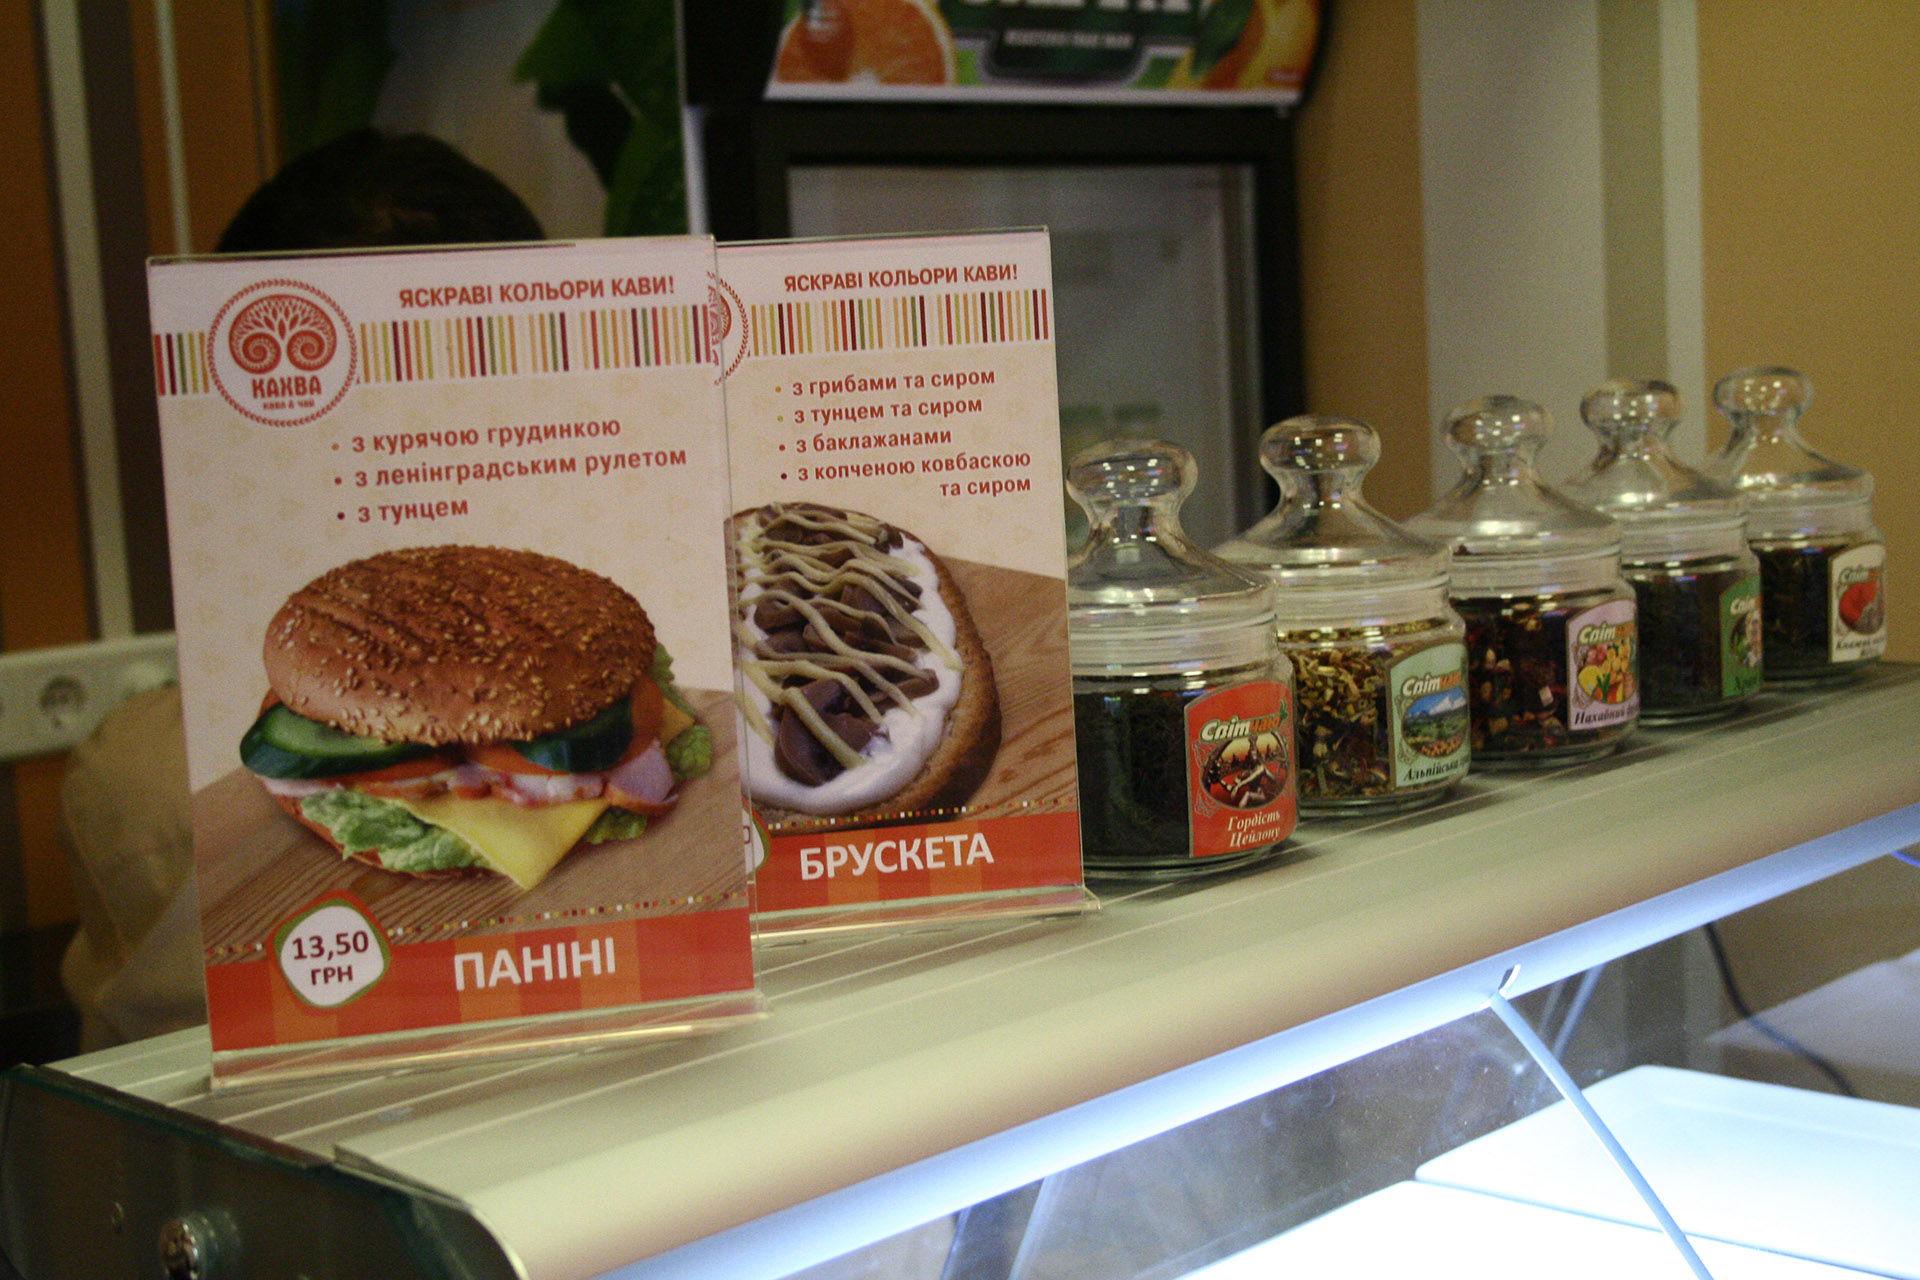 Сorporate identity of the restaurant